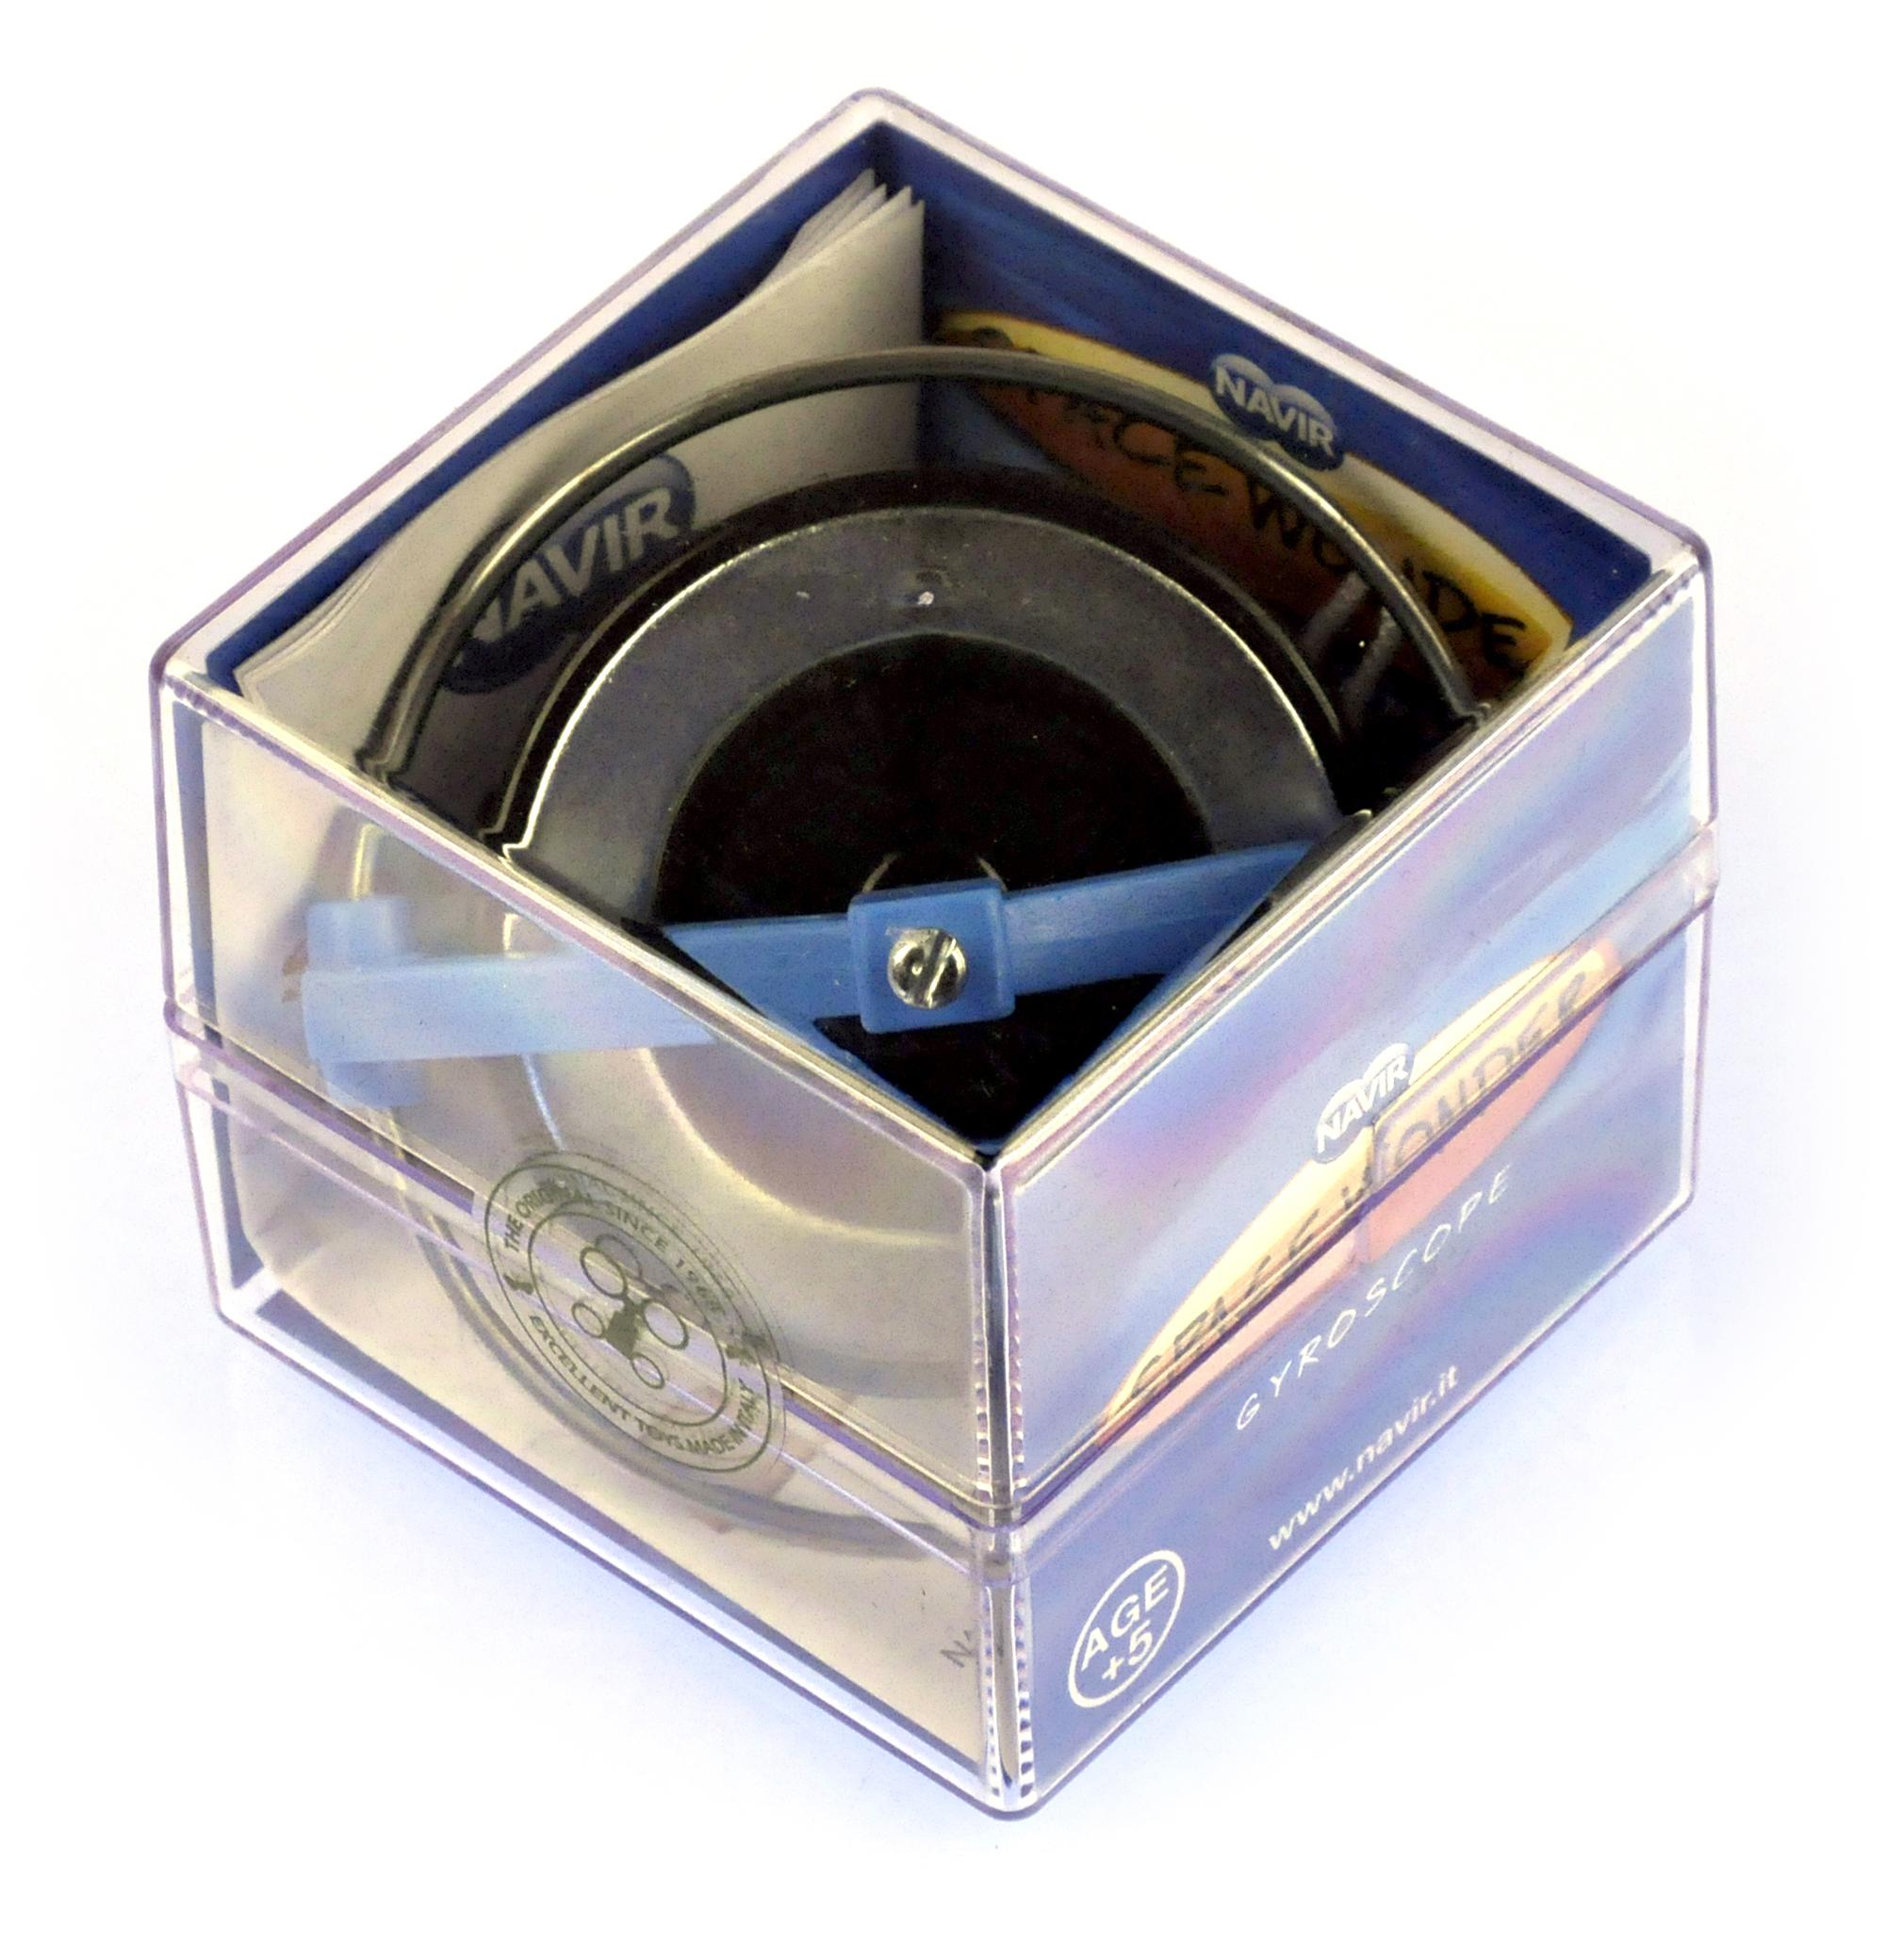 navir raum wunder klassisch gyroskop zuf llig farben ebay. Black Bedroom Furniture Sets. Home Design Ideas